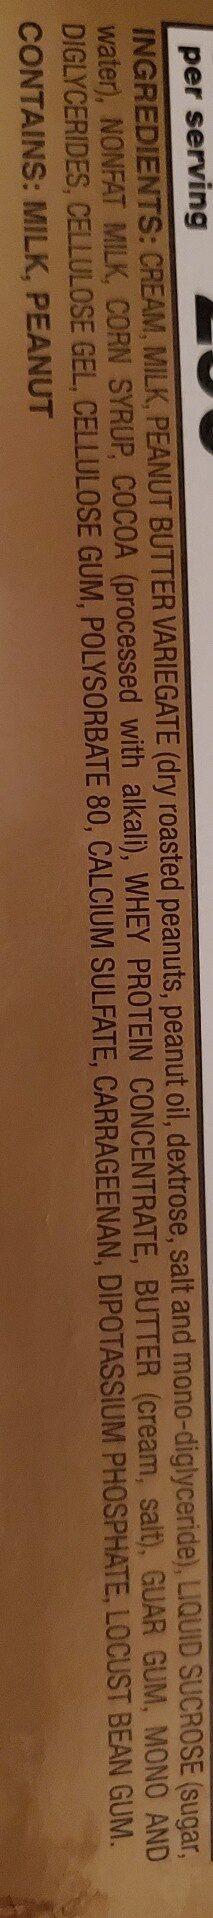 Stewart's chocolate peanut butter cup ice cream - Ingredienti - en